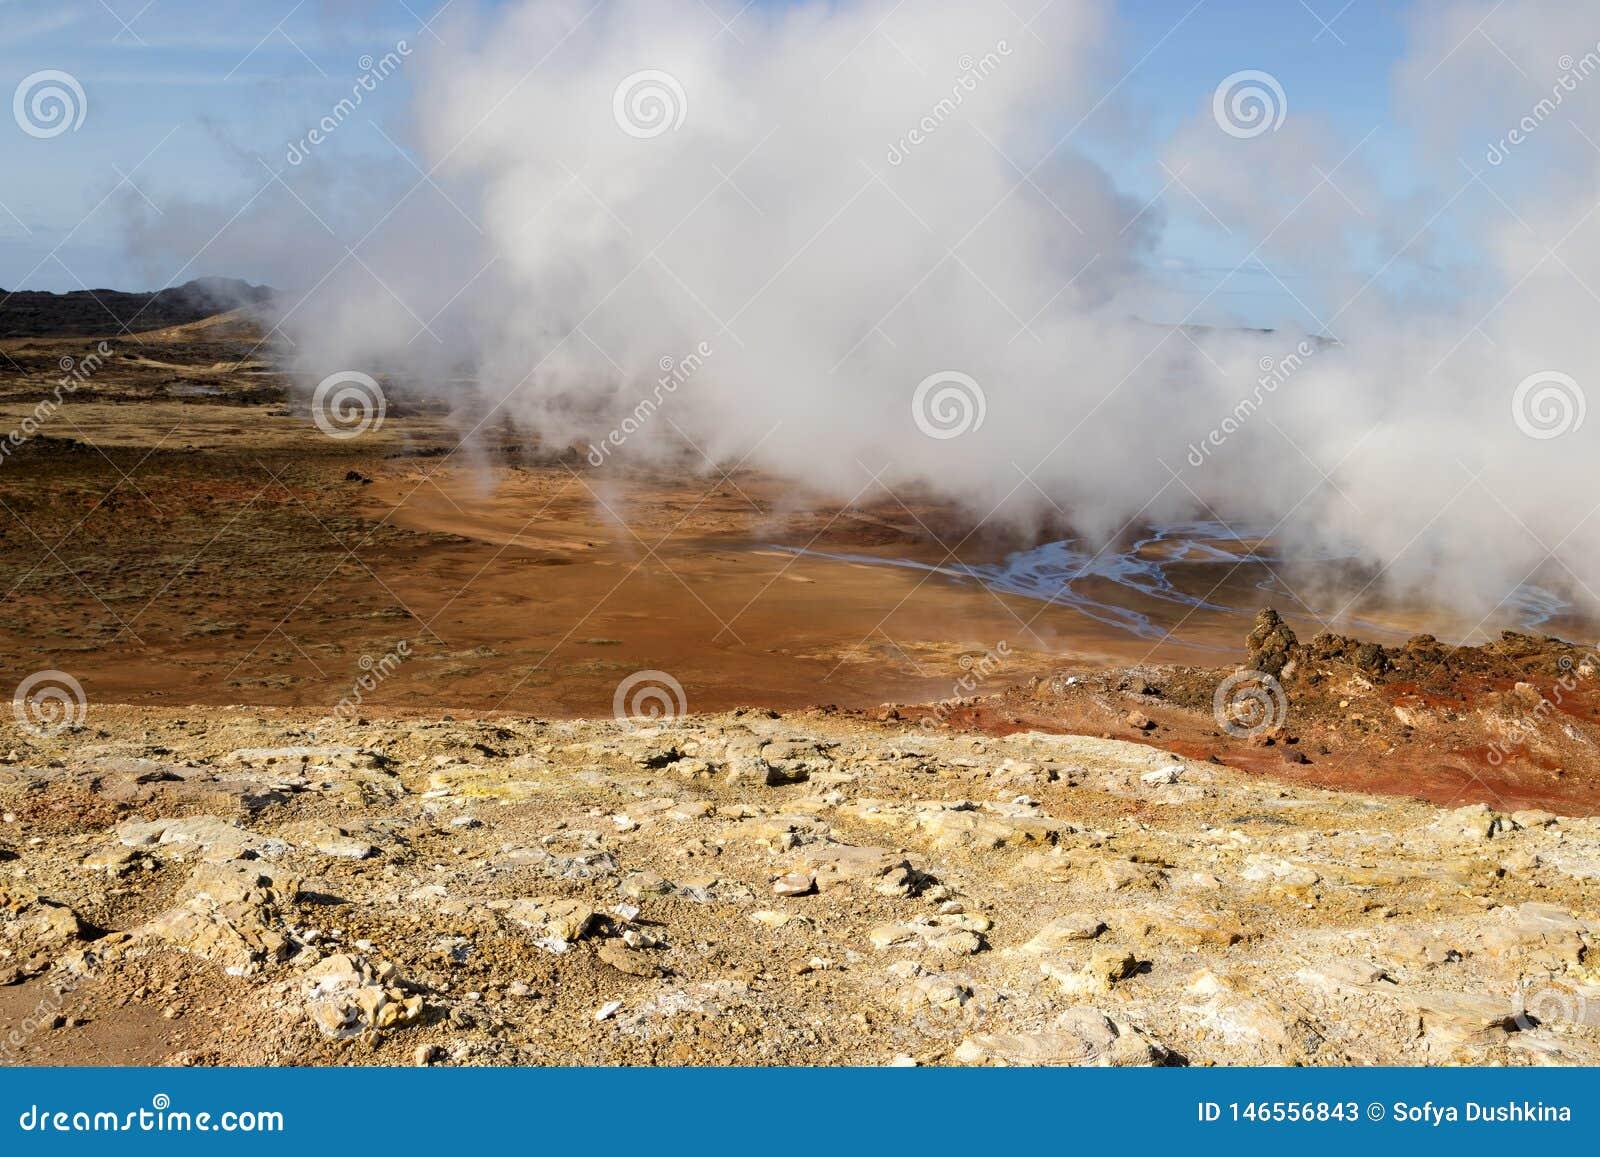 Gunnuhver geothermal area in Iceland. Geyser steam